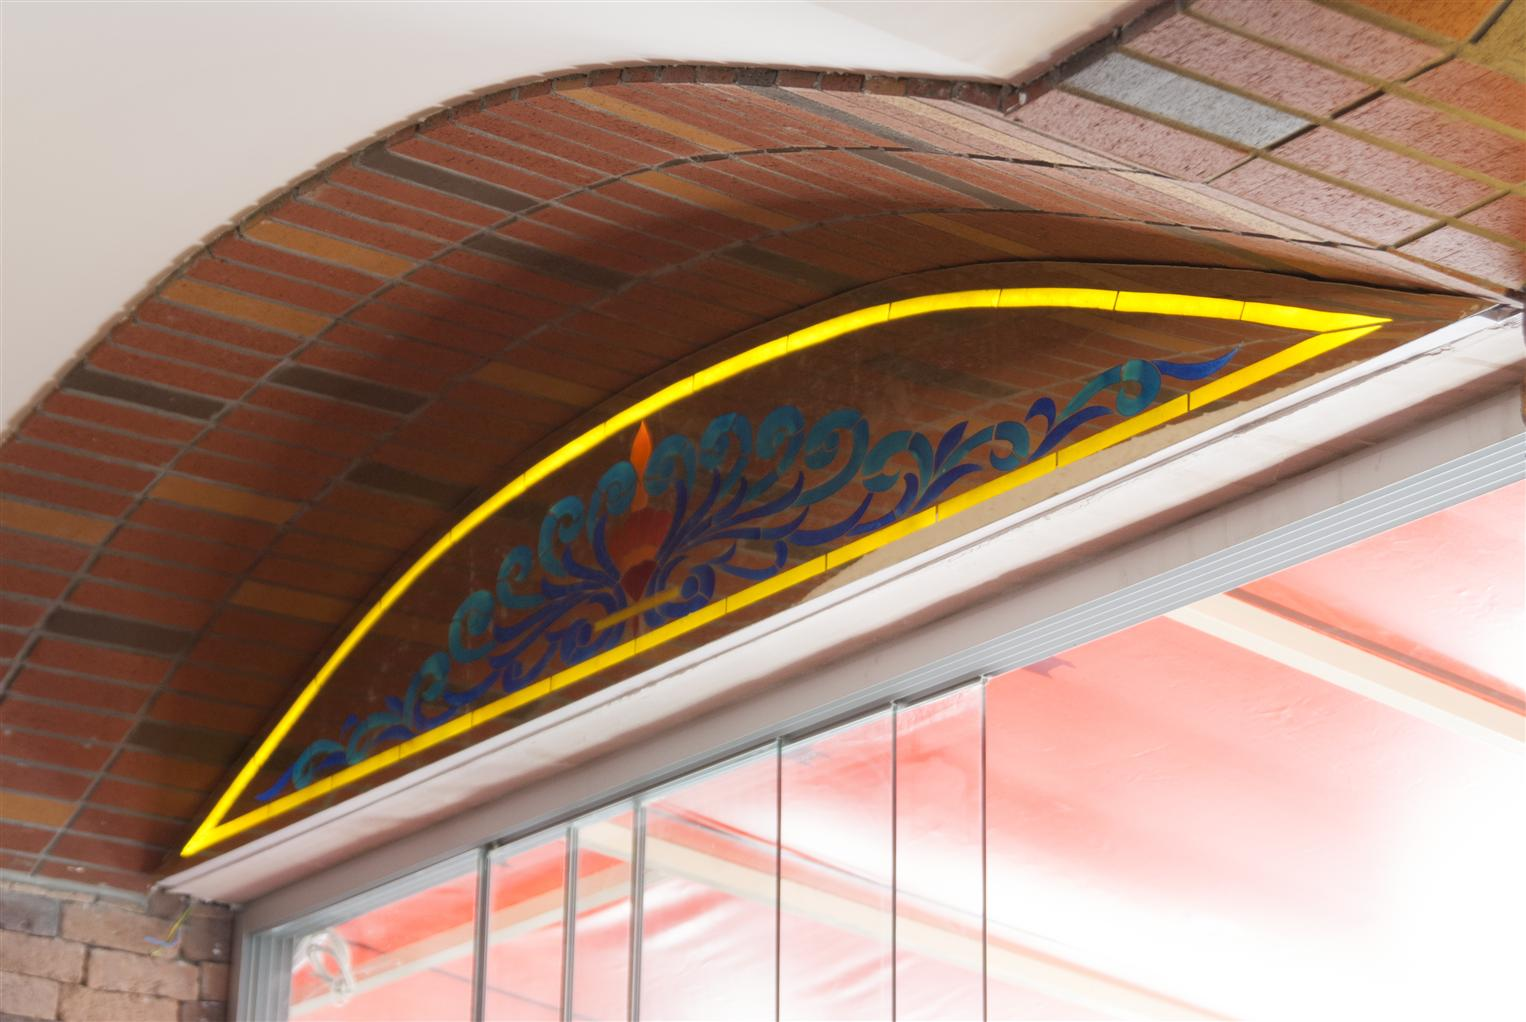 adria-cafe2015921173543978.jpg izmir vitray çalışması